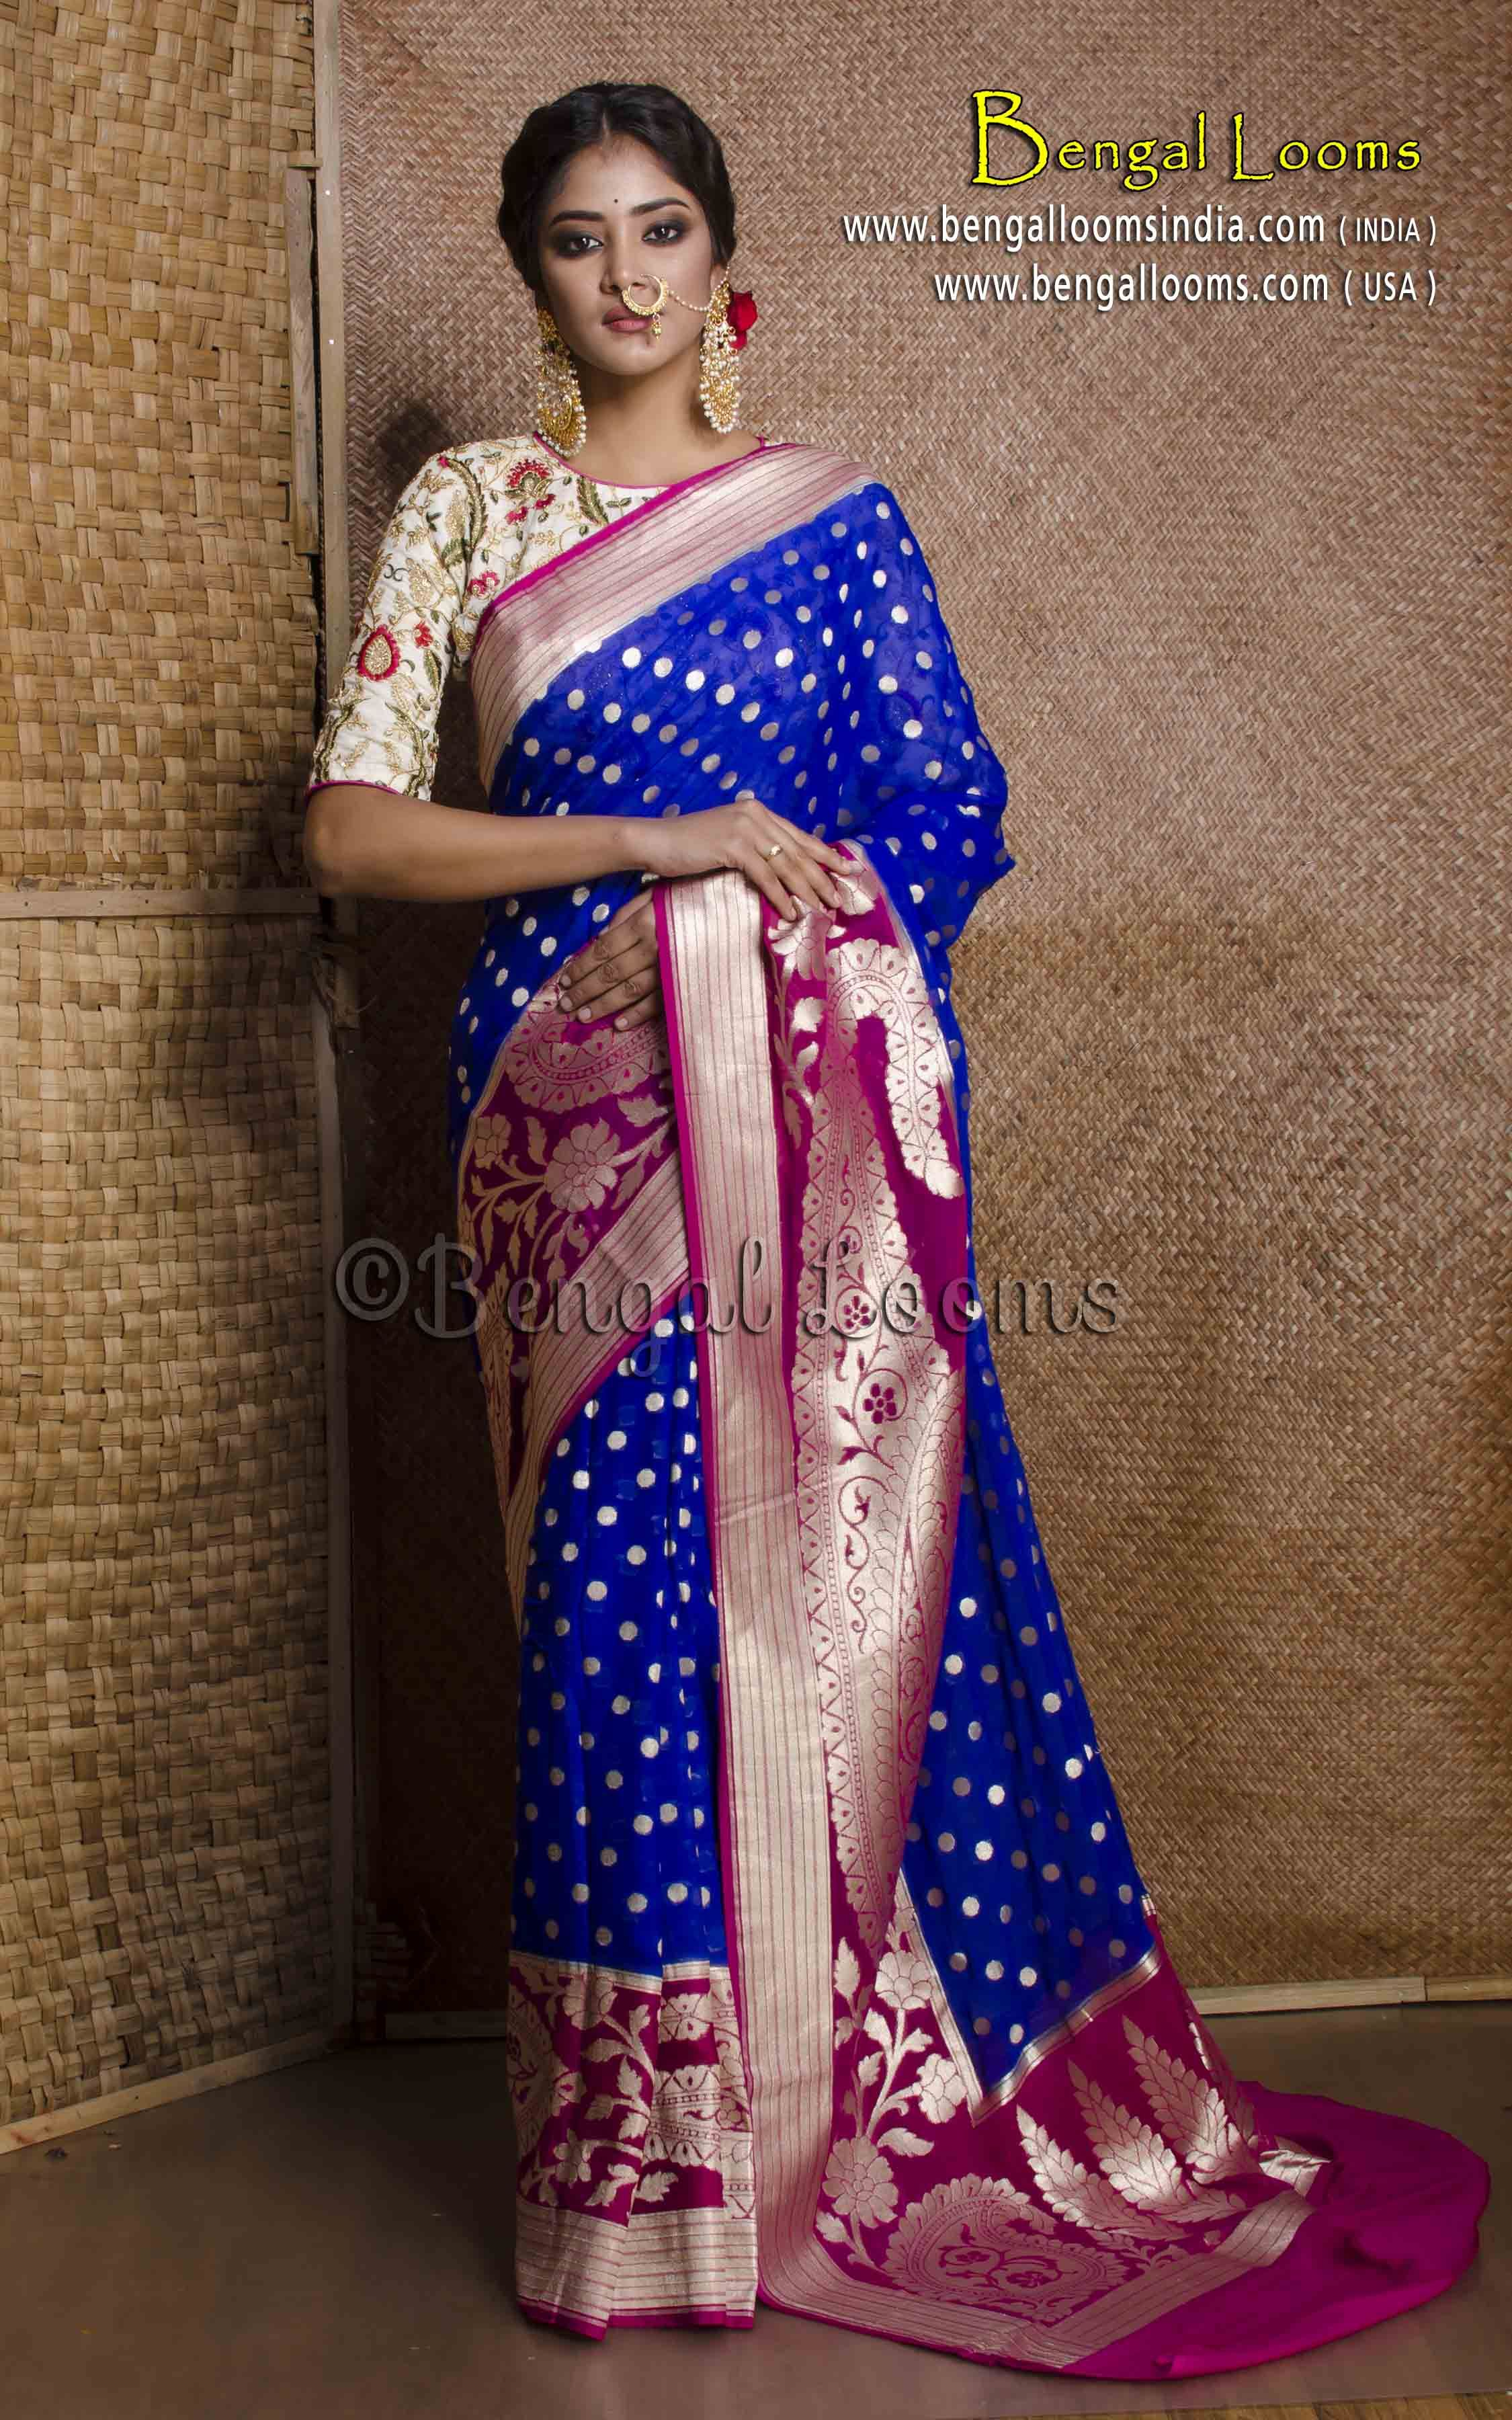 e4914c0ca46 Pure Handloom Royal Blue Georgette Silk Banarasi Saree in Royal Blue and  Magenta